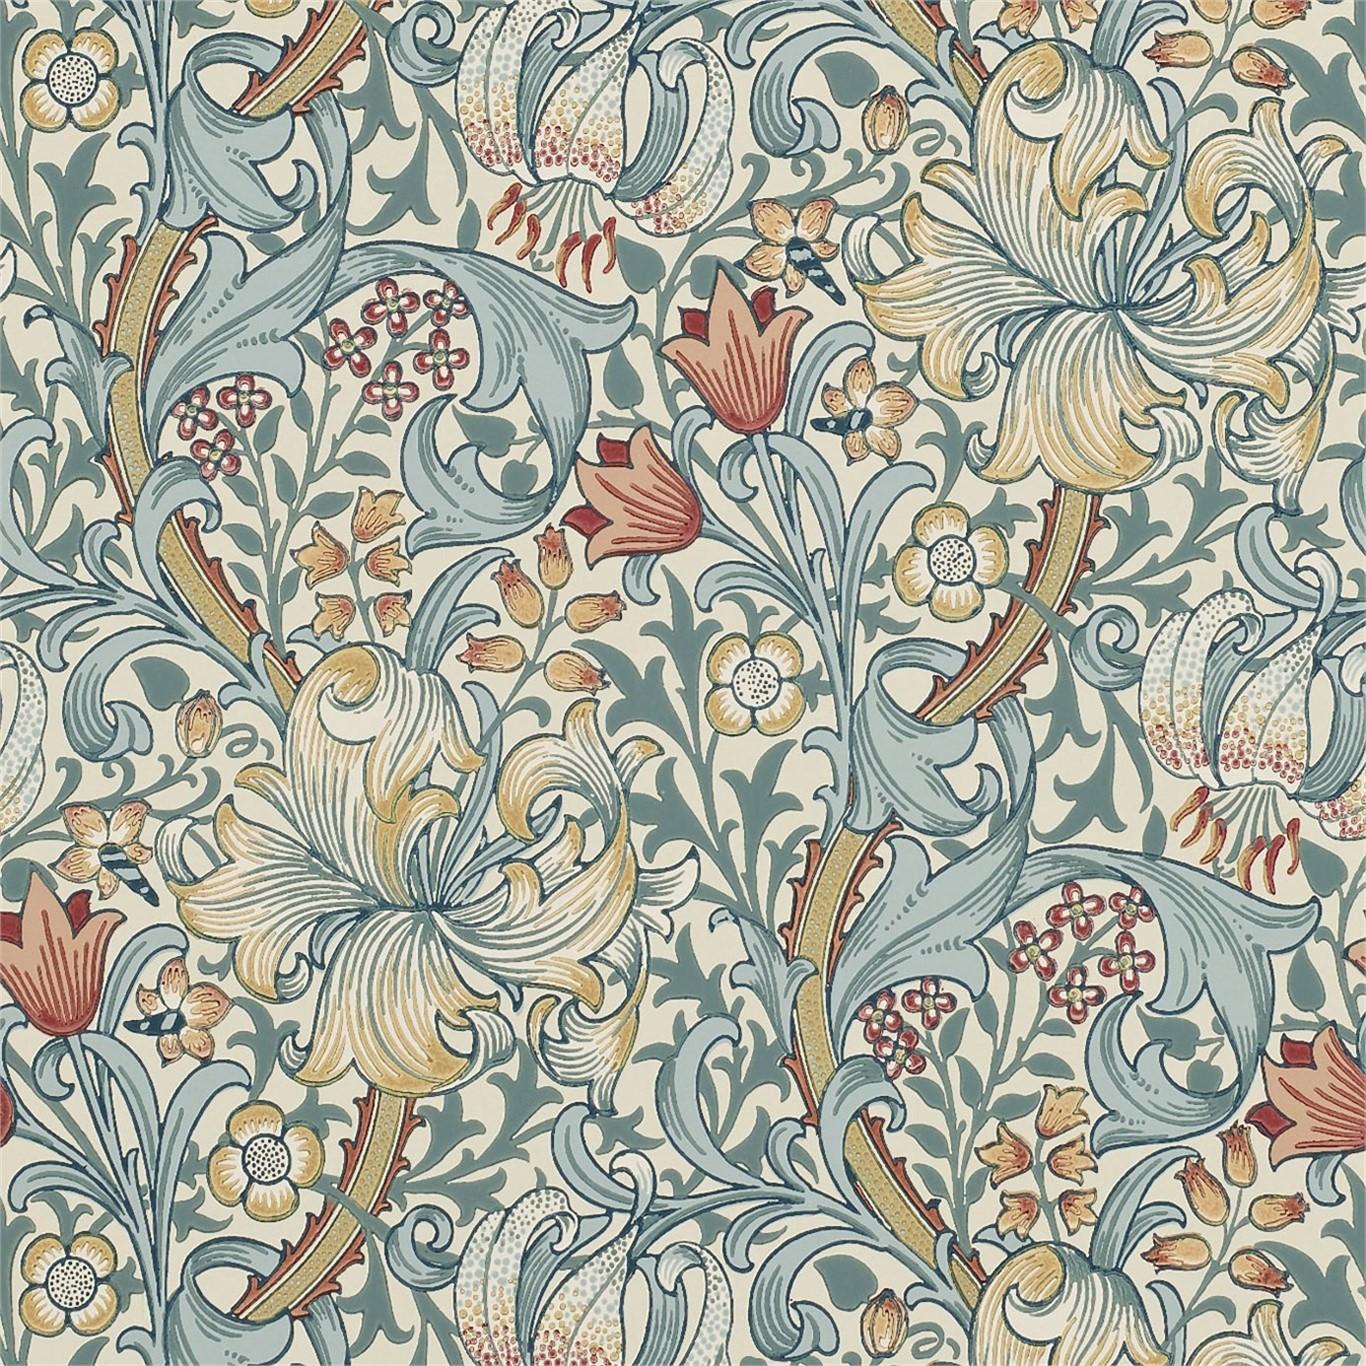 Tapet William Morris Golden Lily 216461